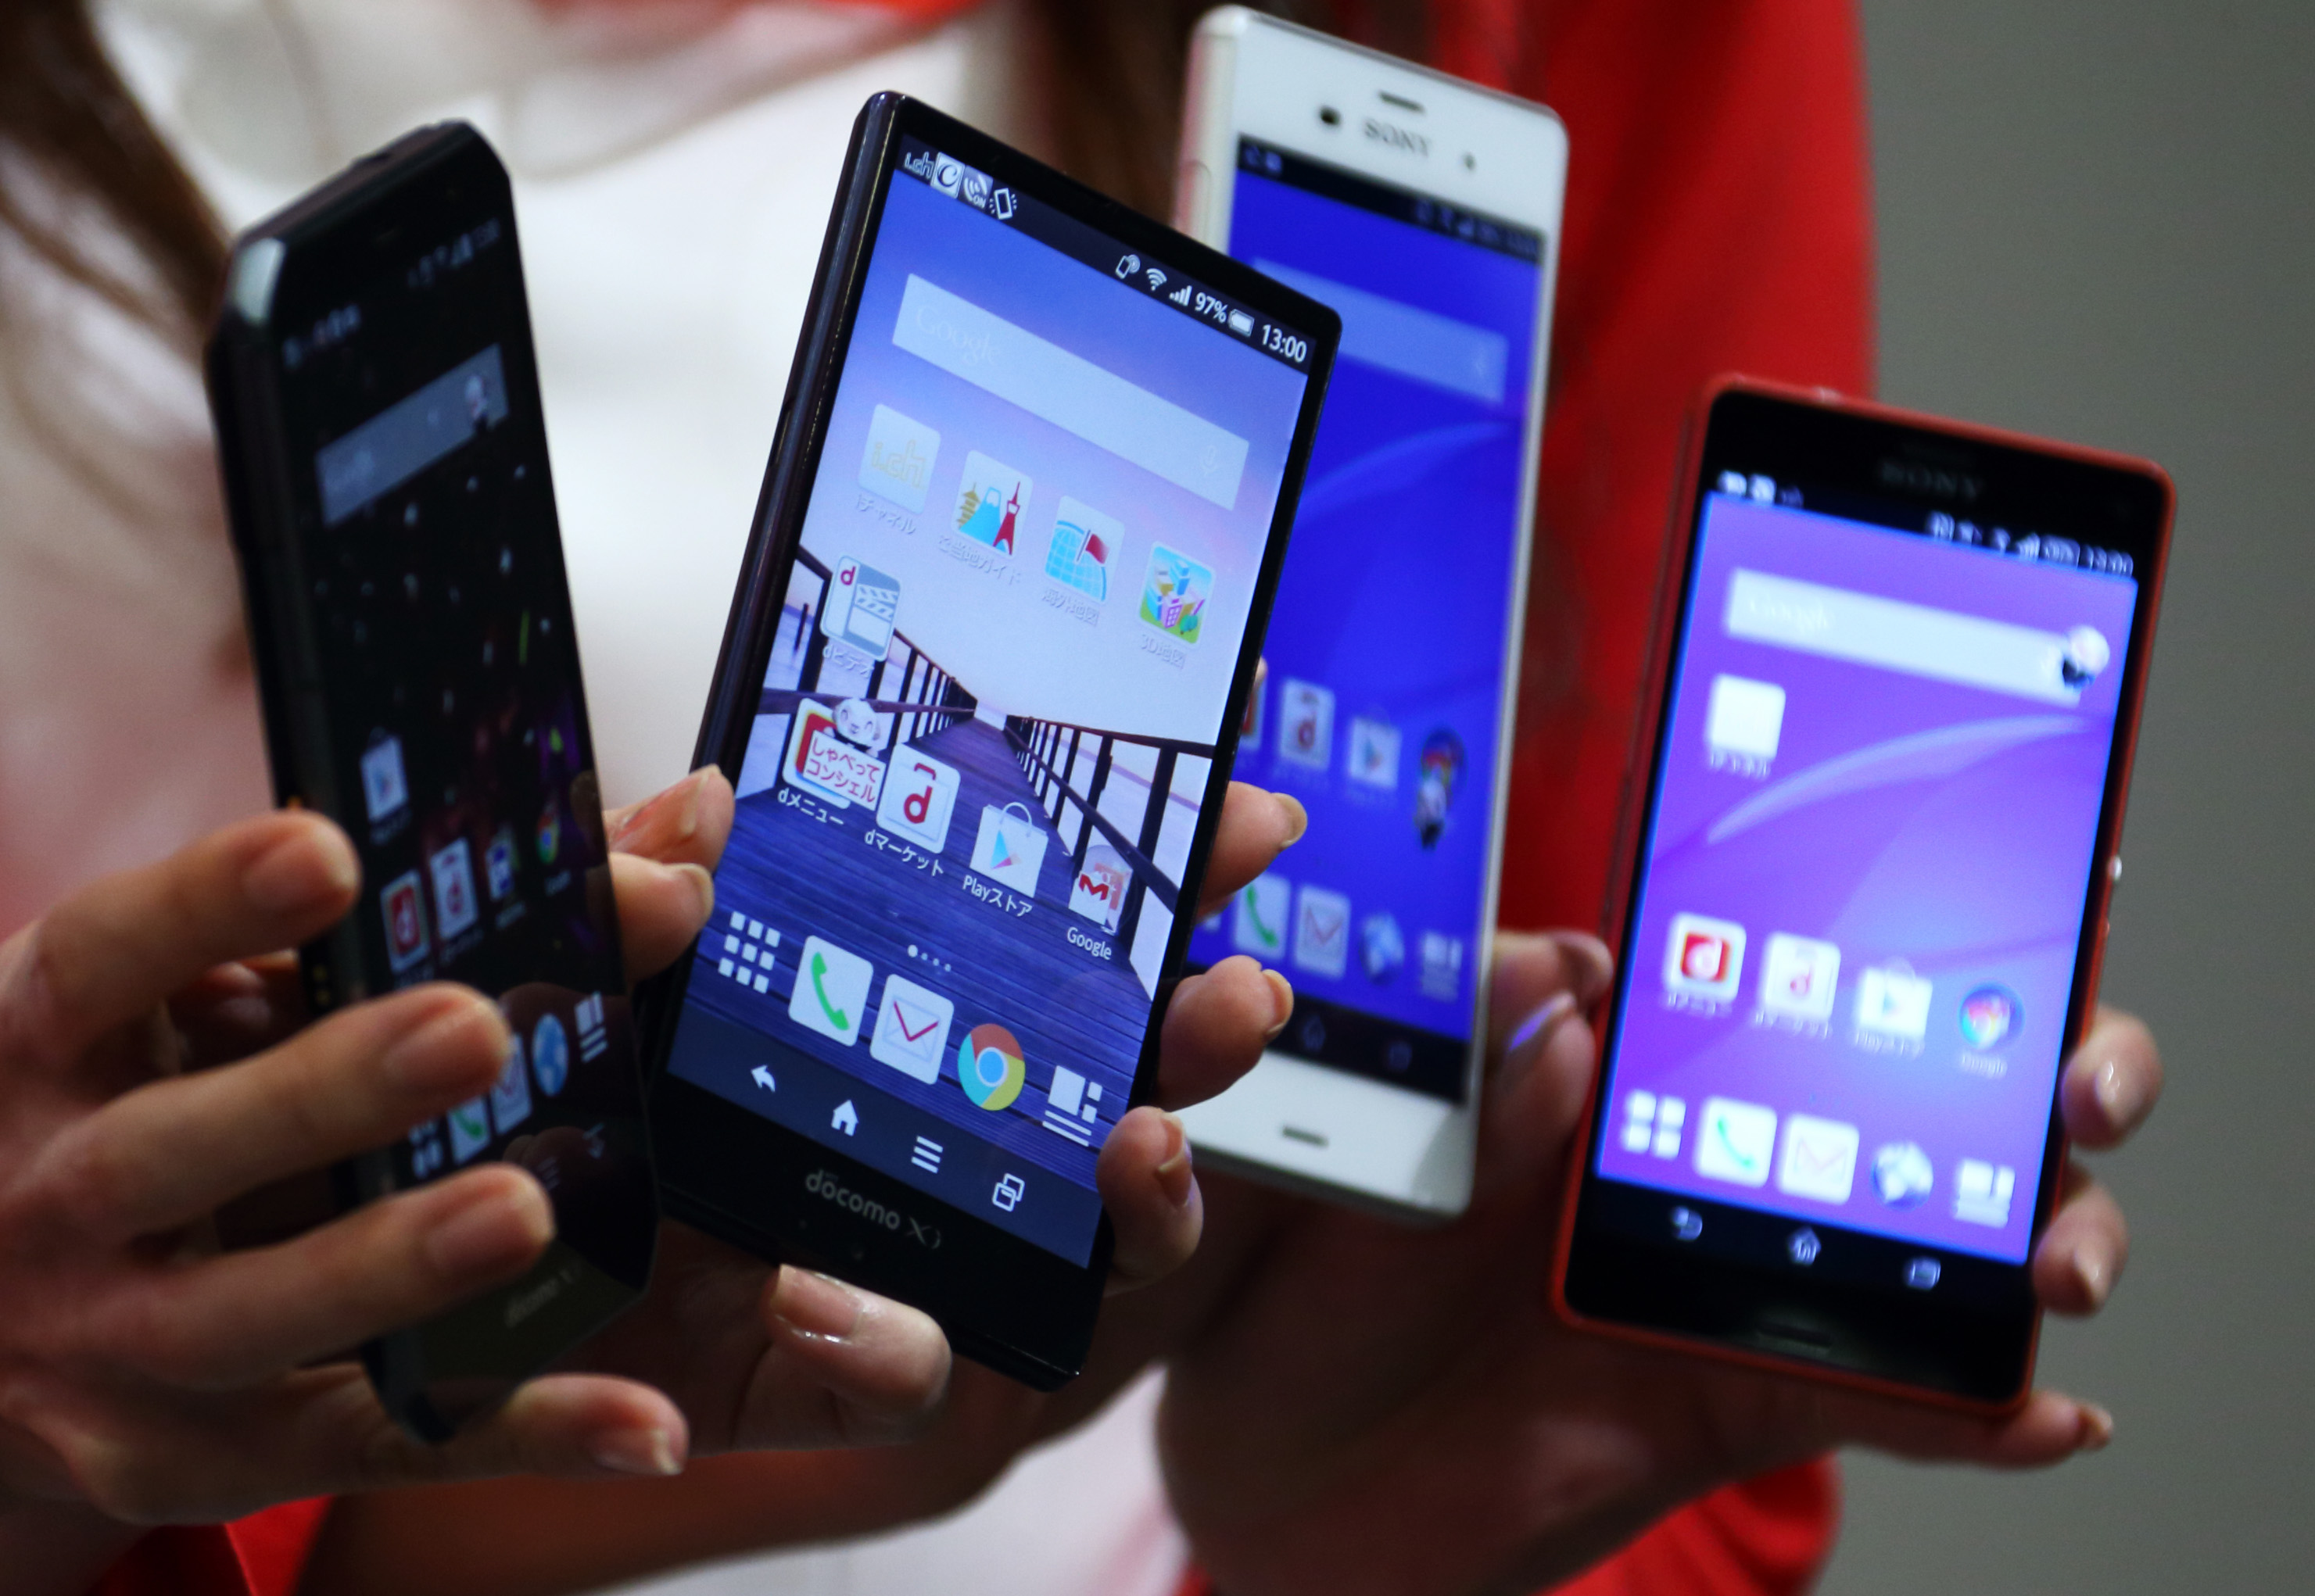 NTT Docomo Inc. President Kaoru Kato Unveils New Smartphones